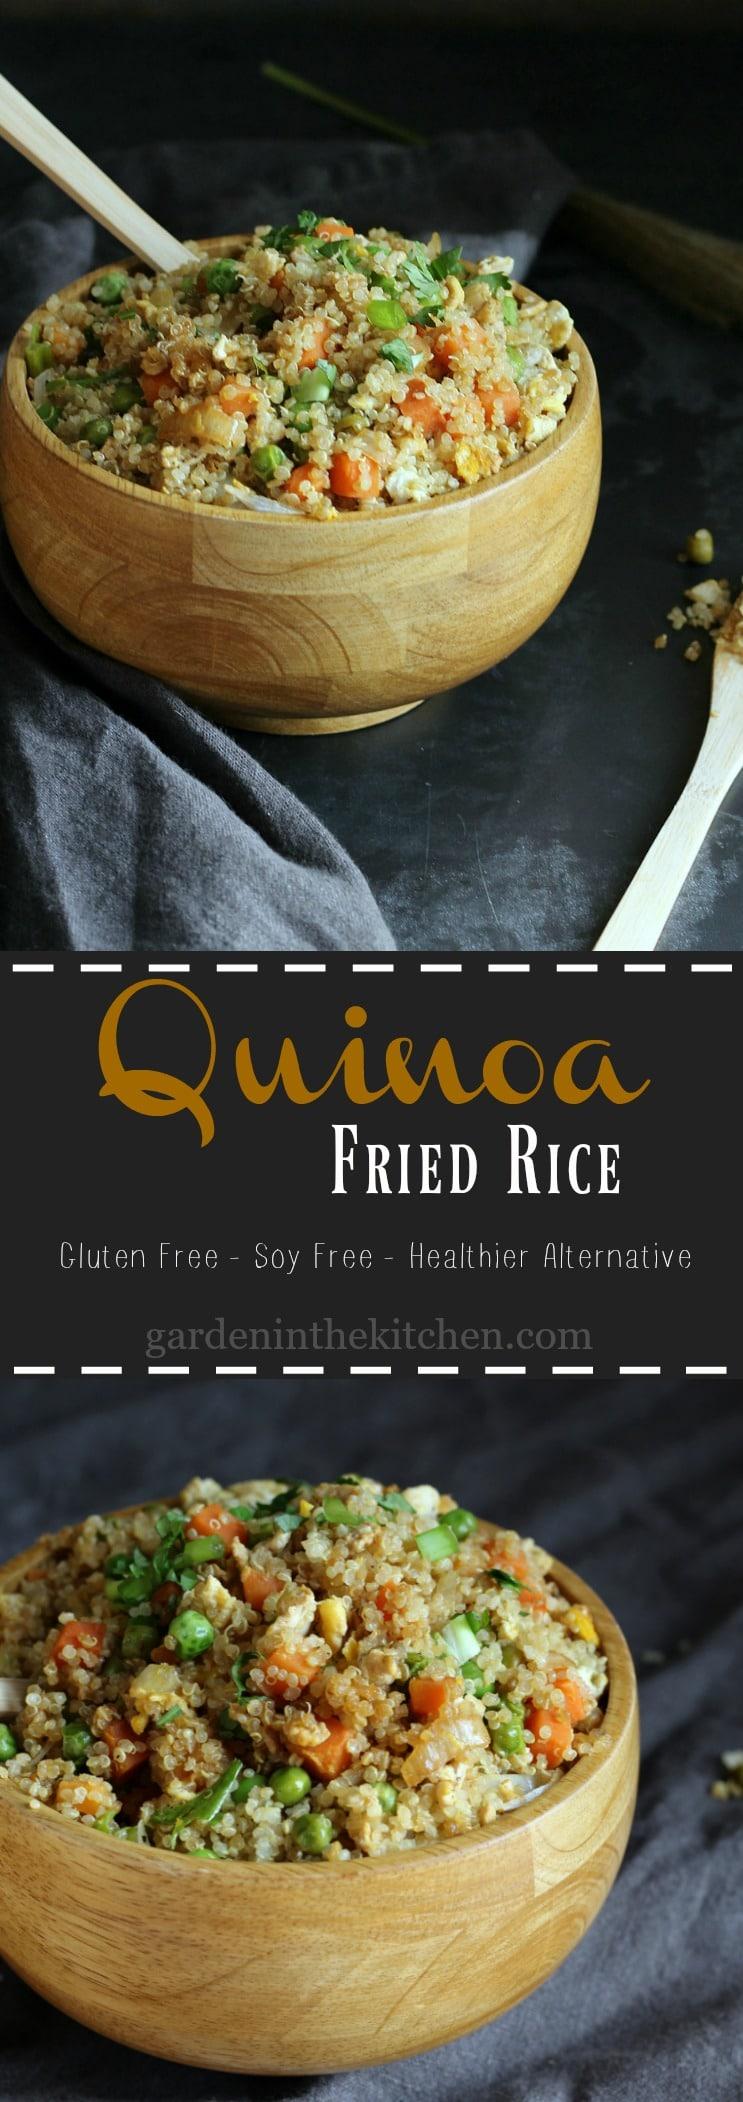 quinoa-fried-rice-long